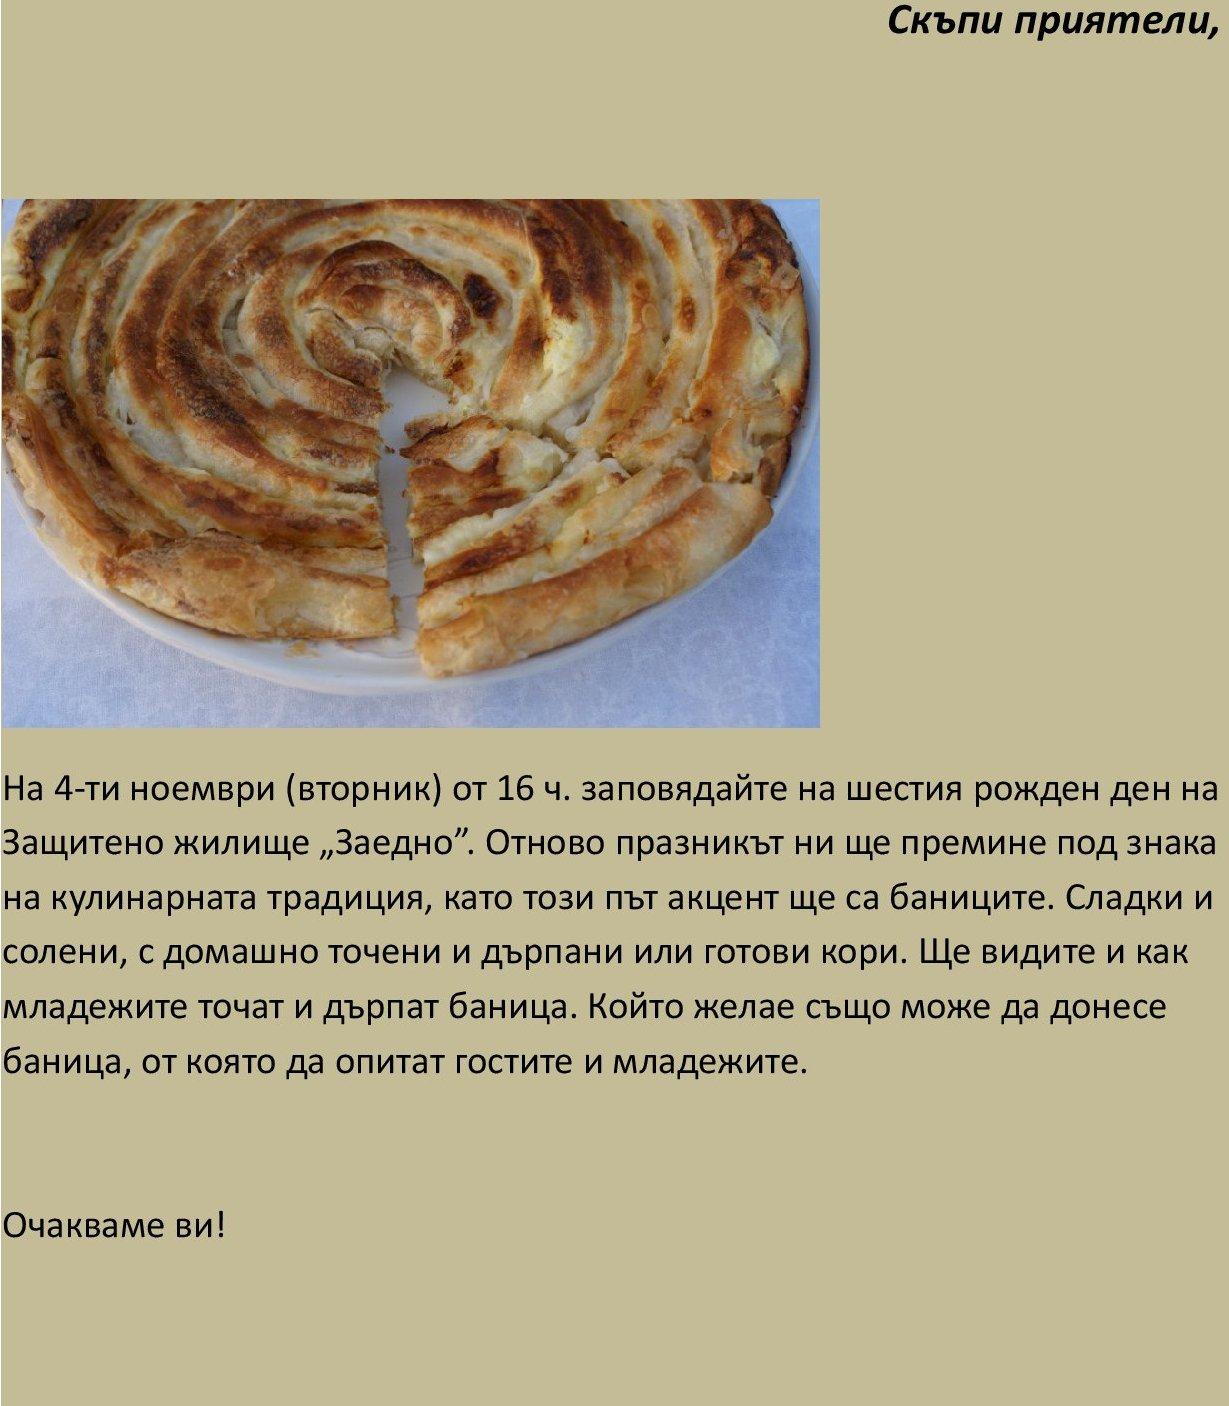 invitation_banitsa